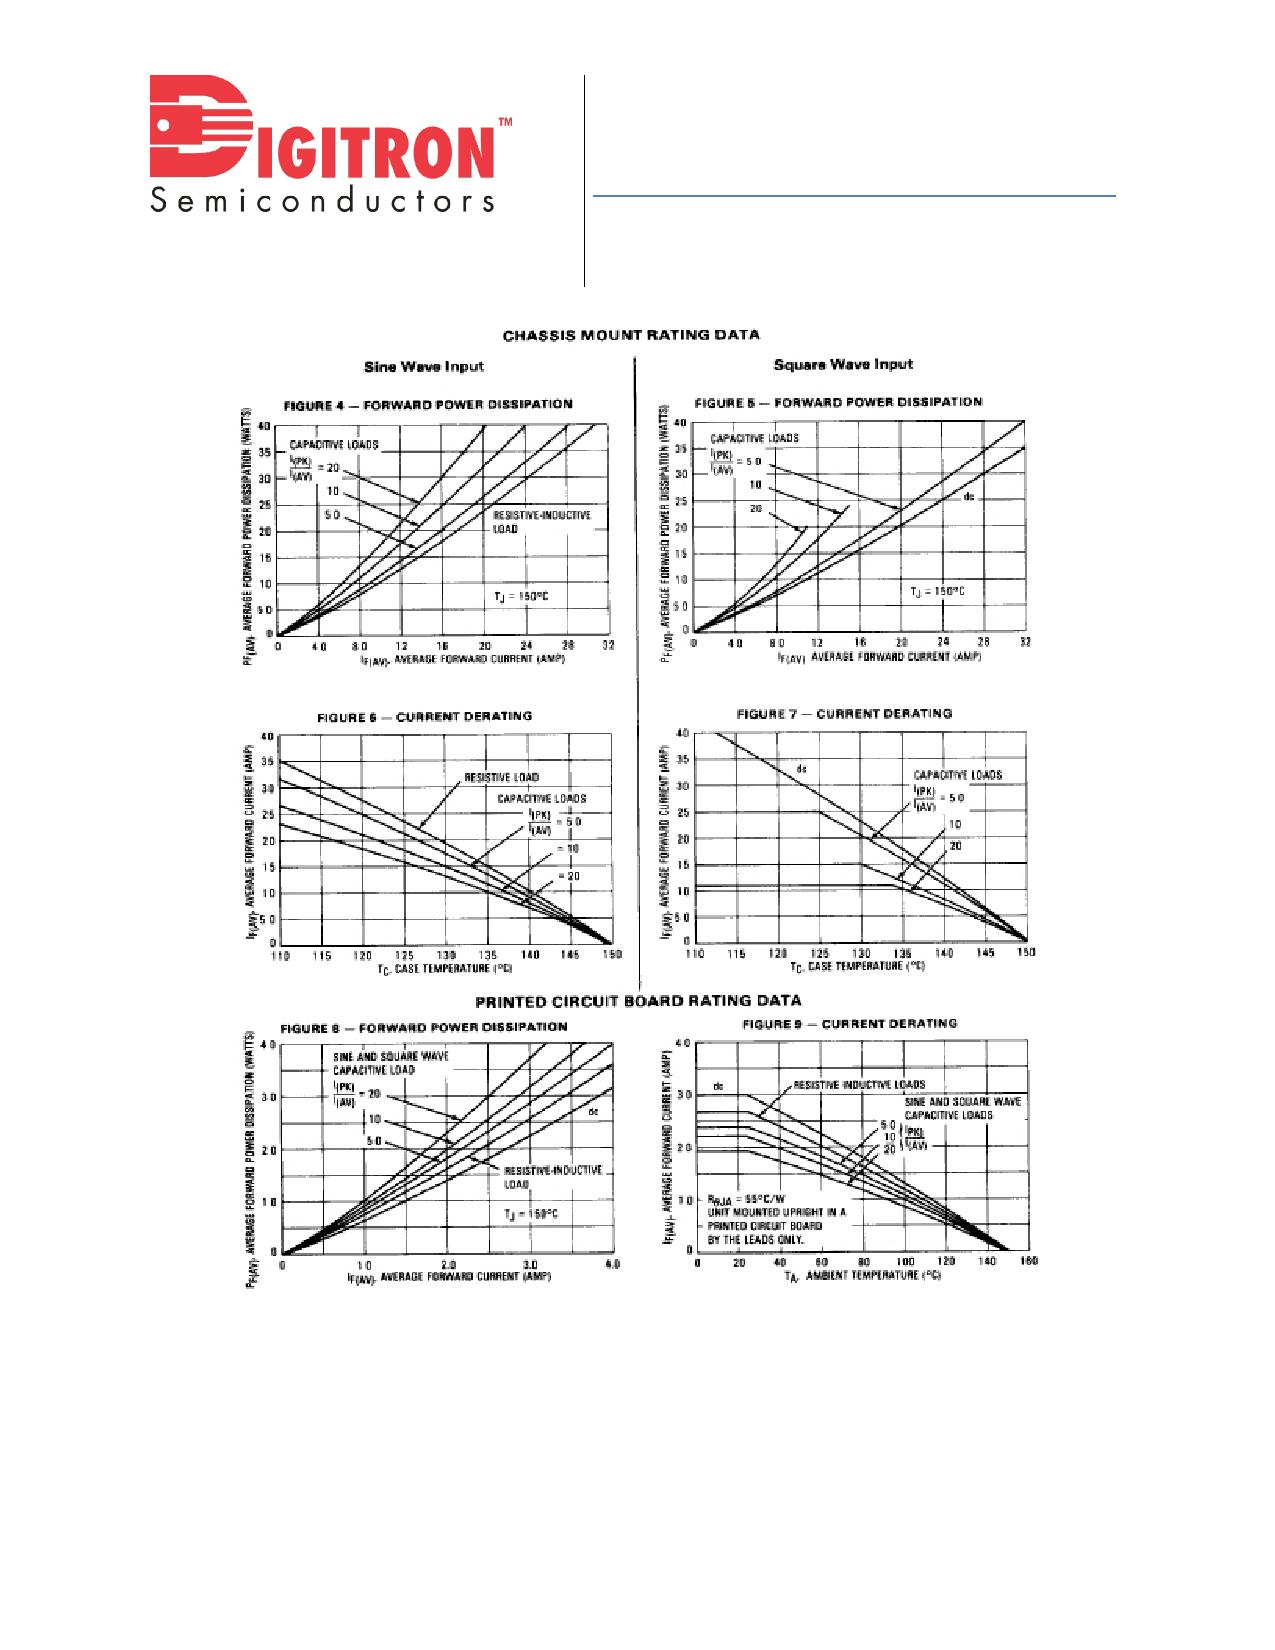 MR2400F pdf, 반도체, 판매, 대치품